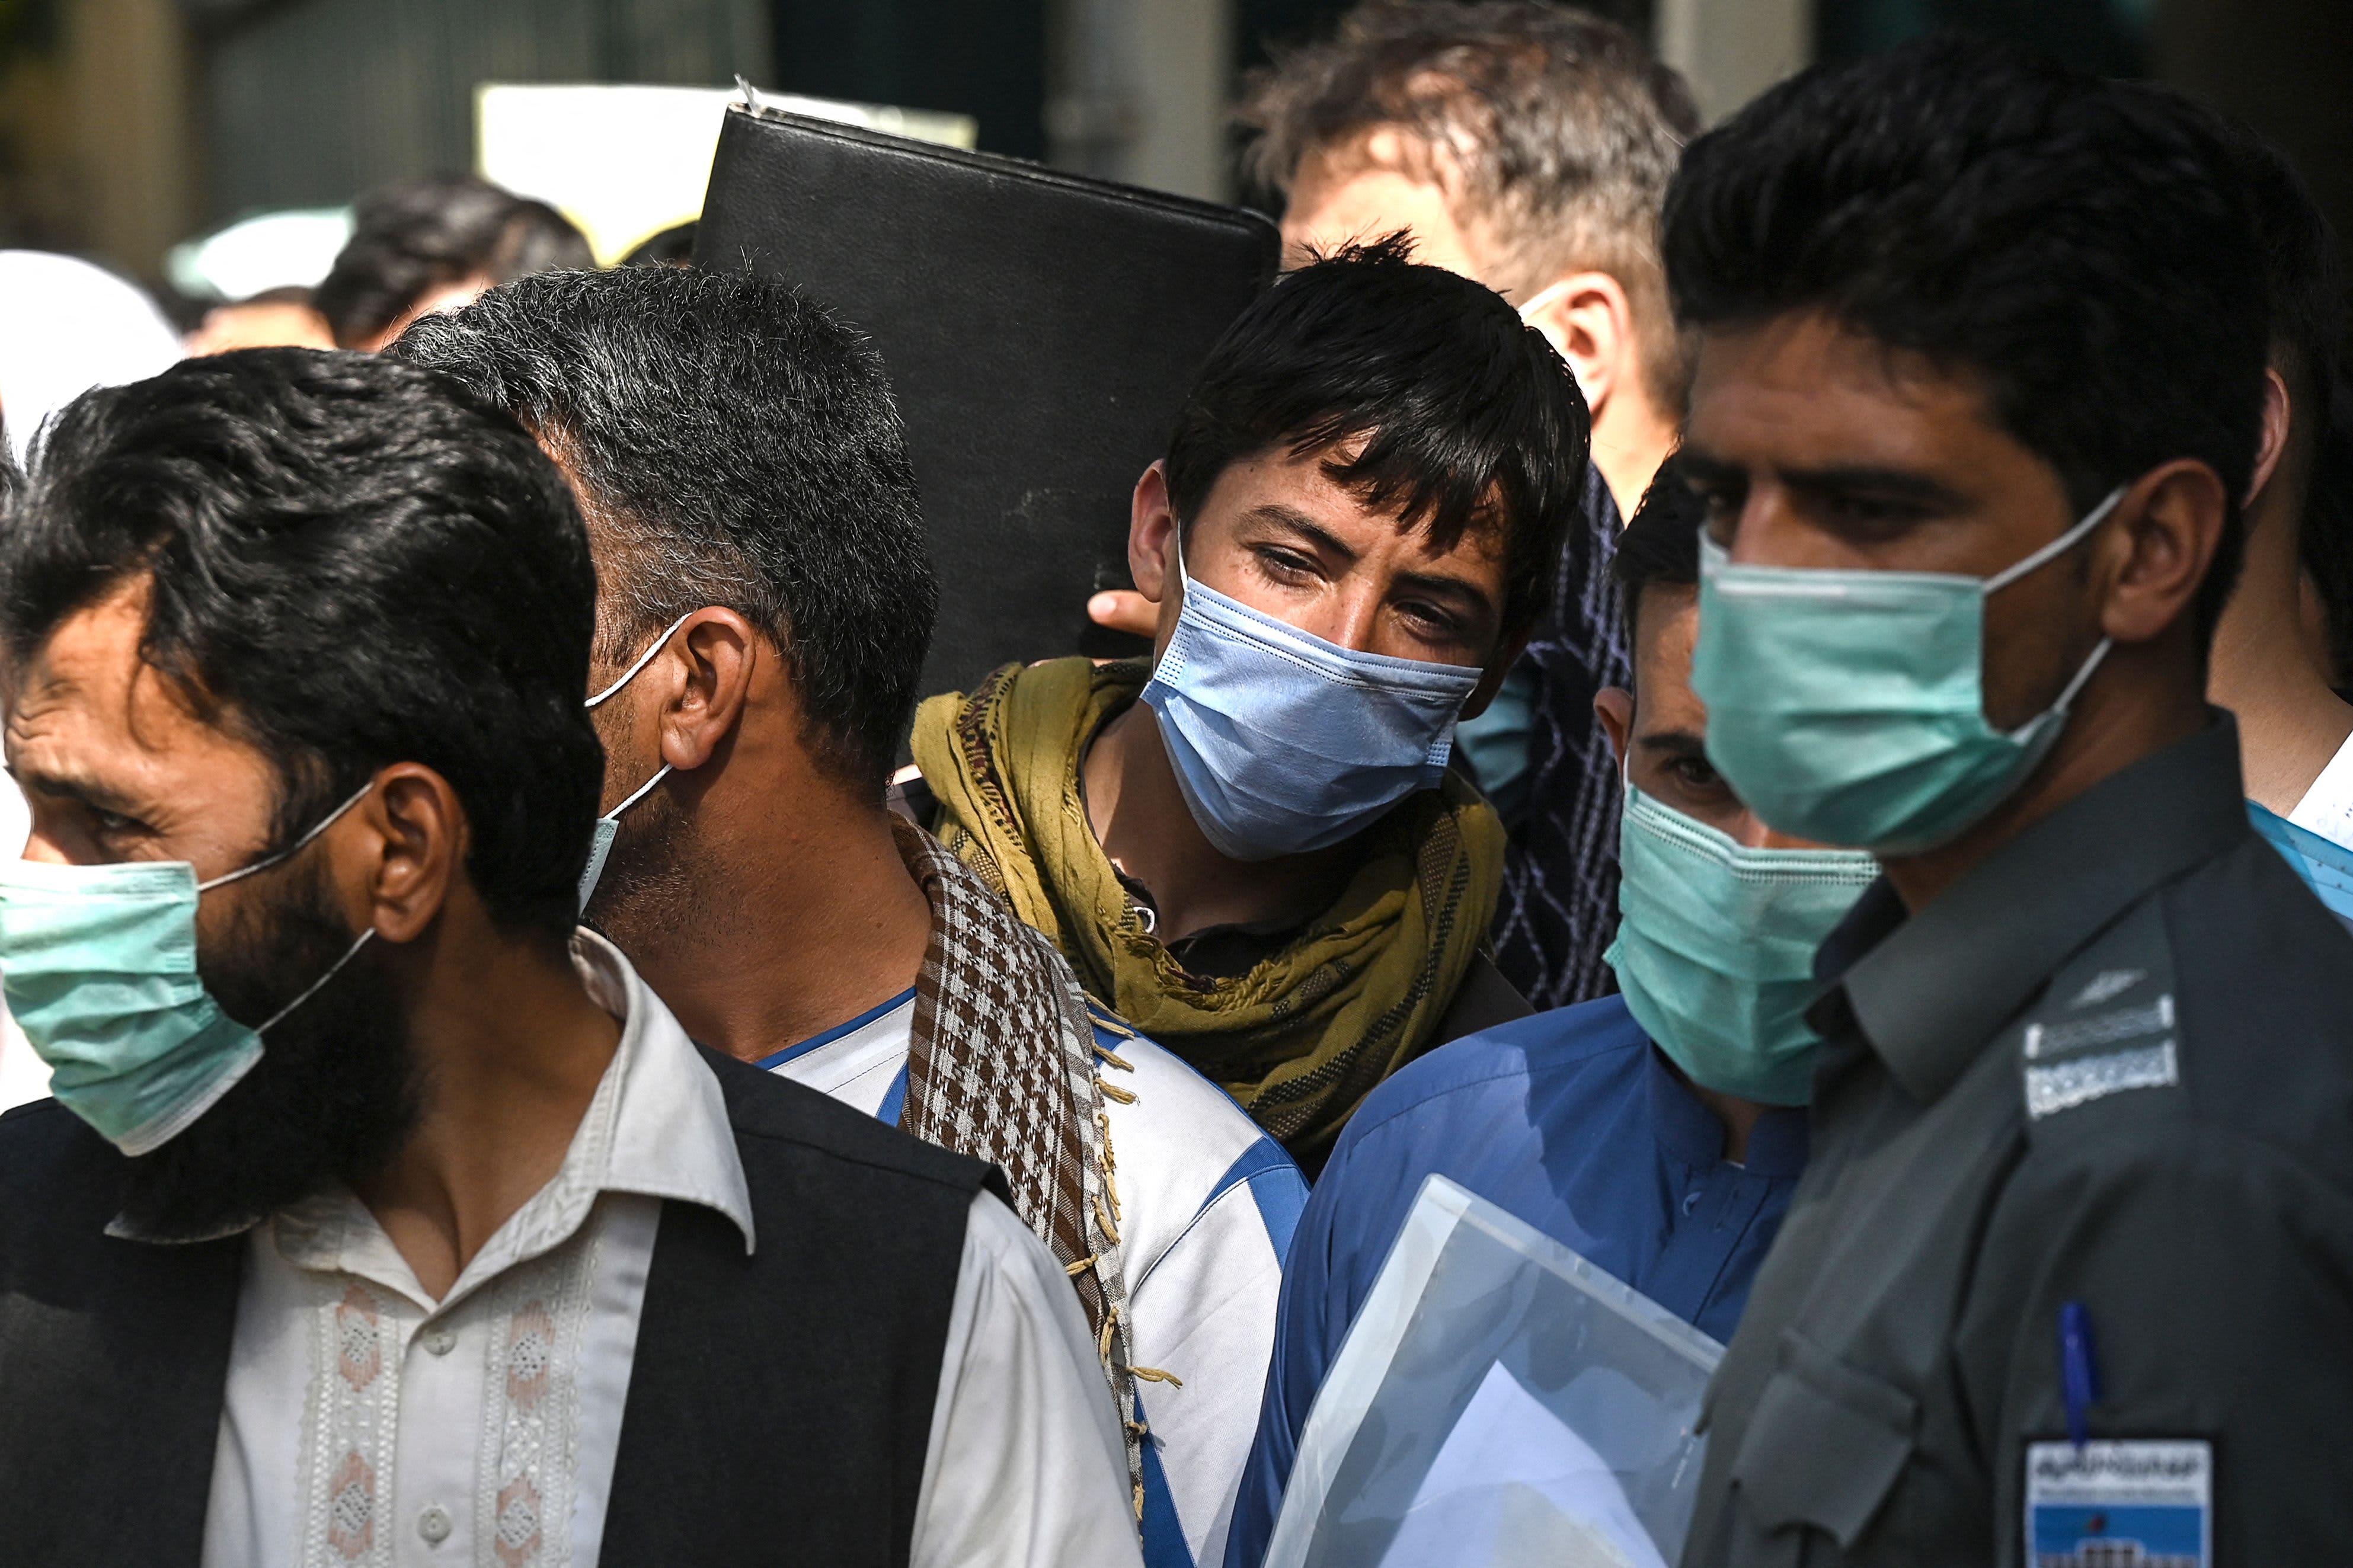 U.S. expands refugee program for Afghans as Taliban escalates violence